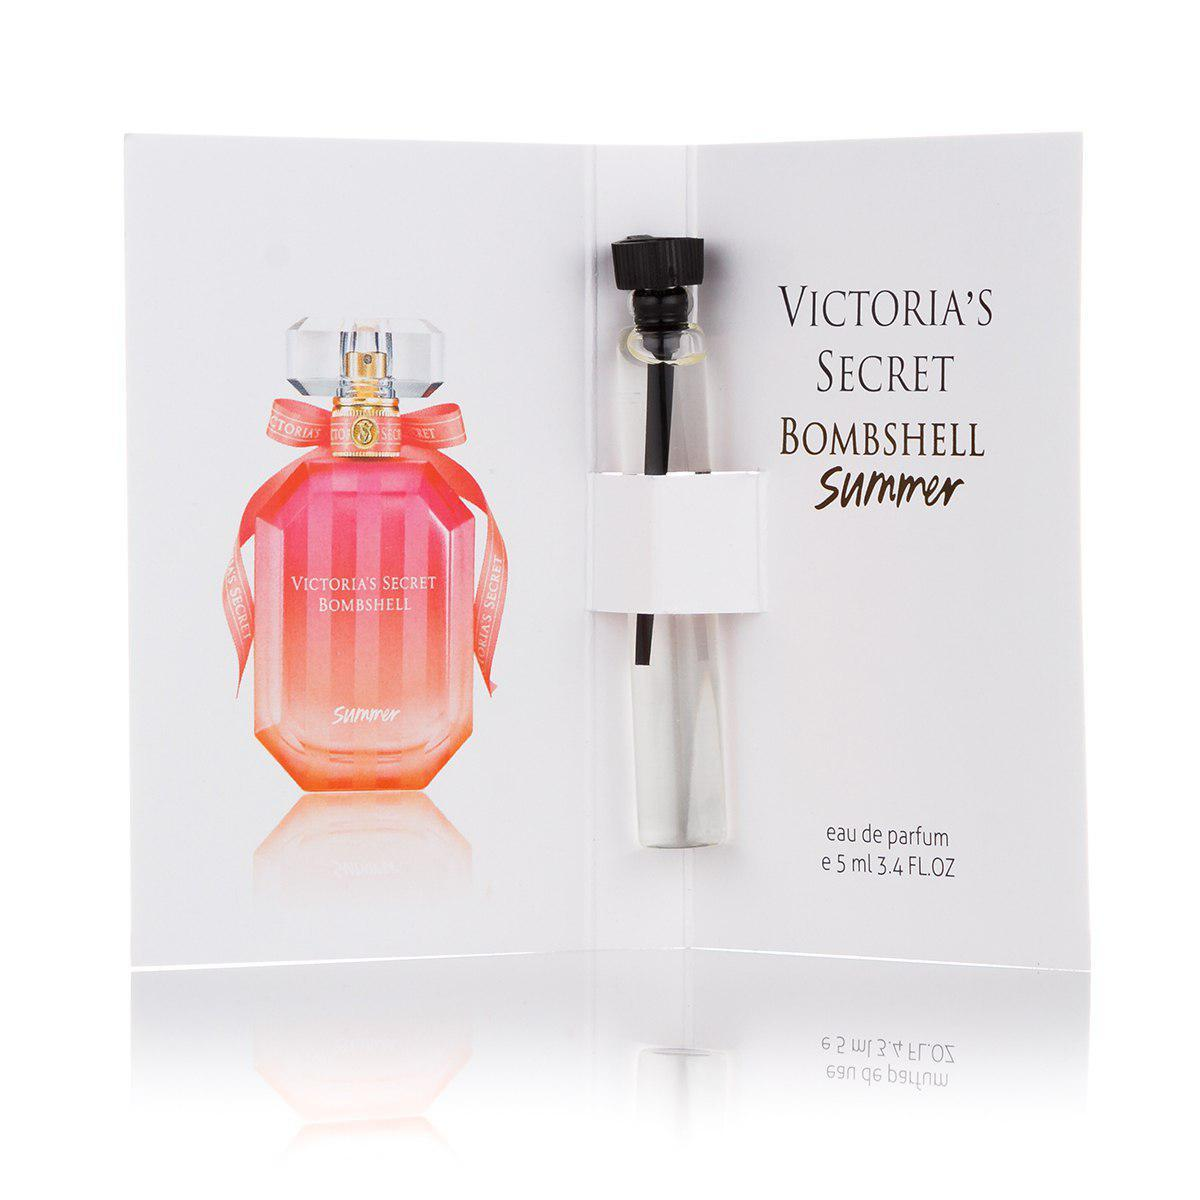 Victoria's Secret Bombshell Summer (ж) 5 ml